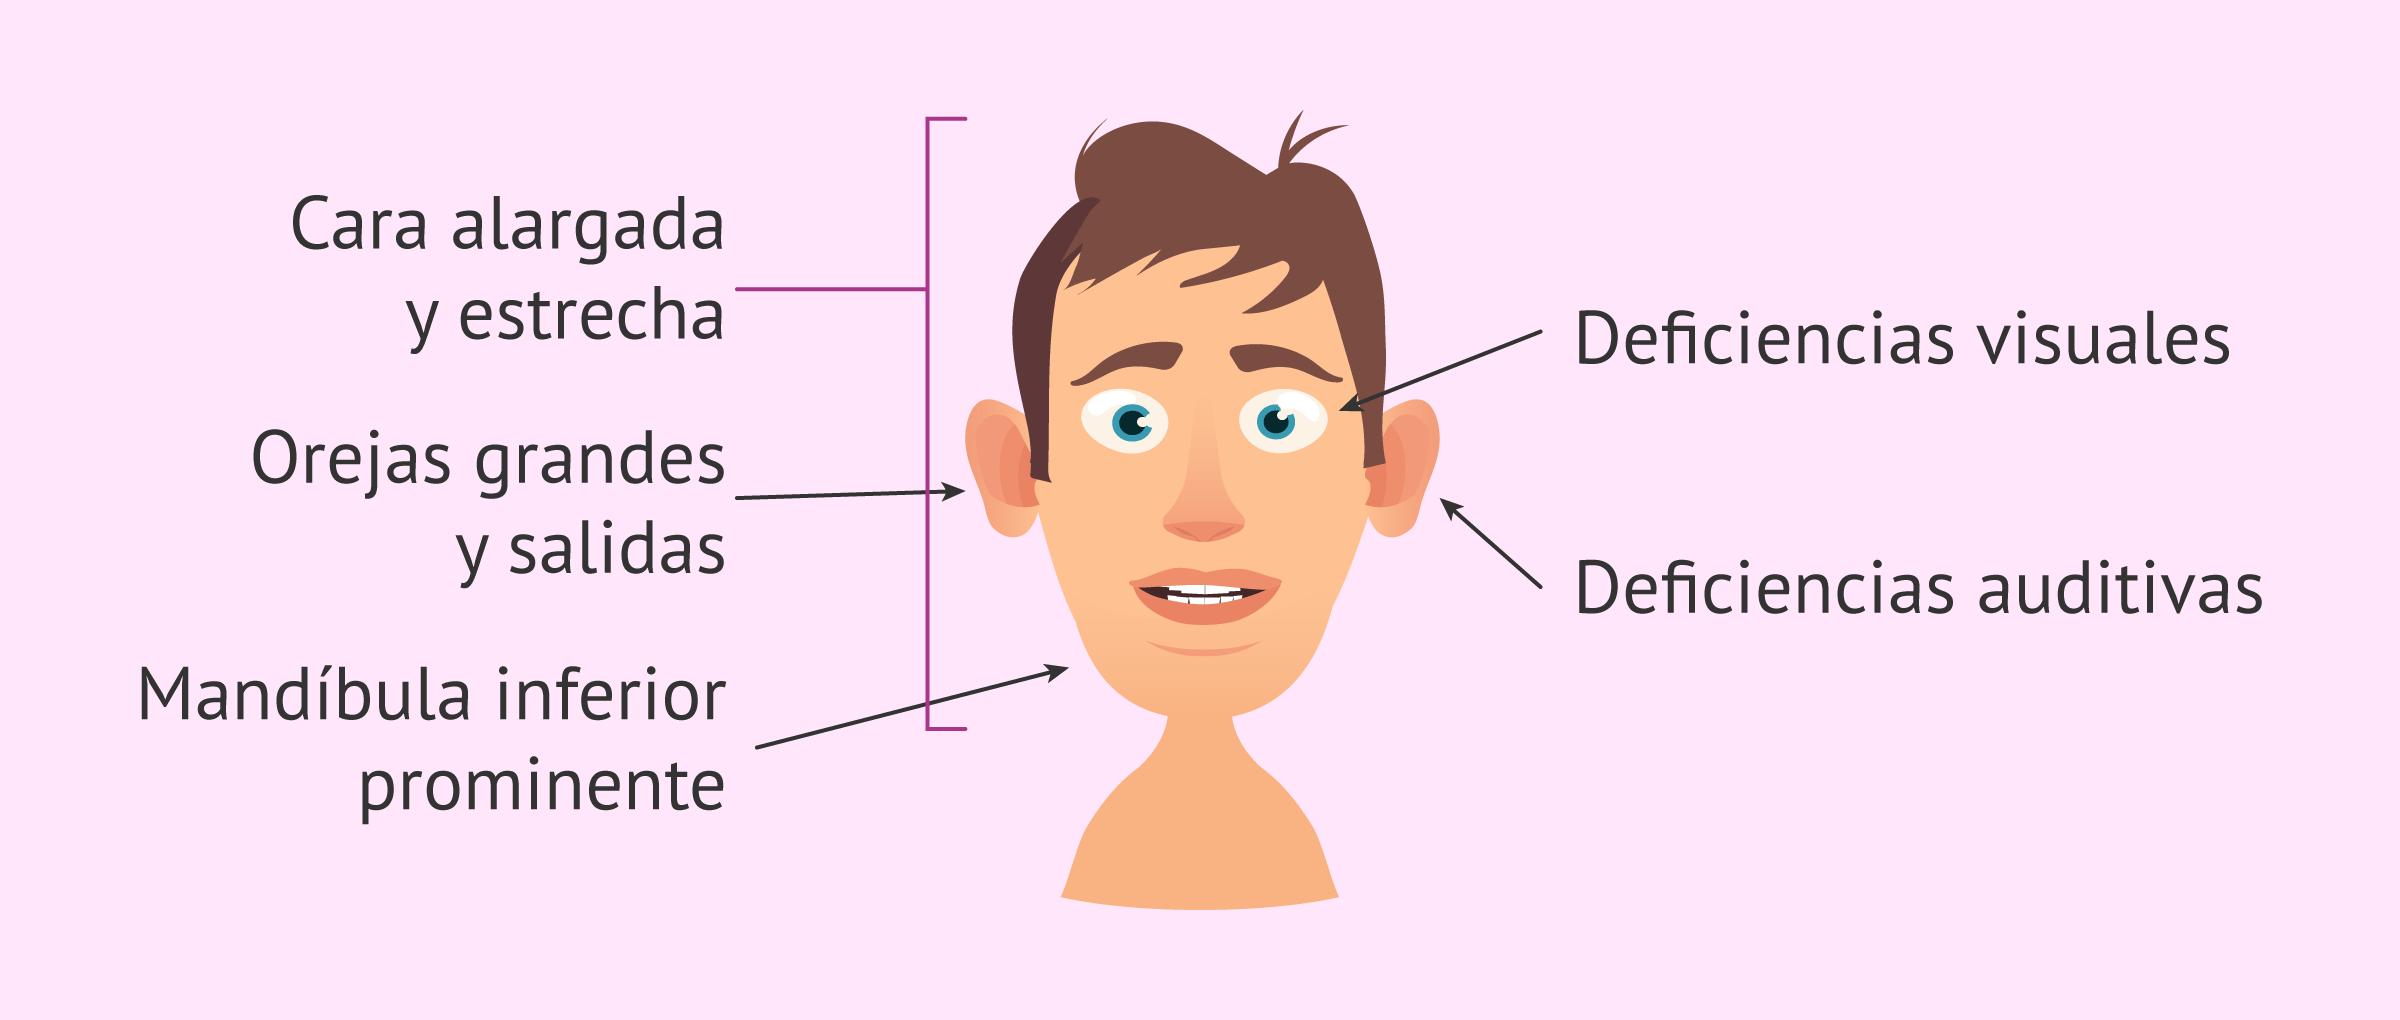 El síndrome X-frágil o de Martin-Bell: características y ...